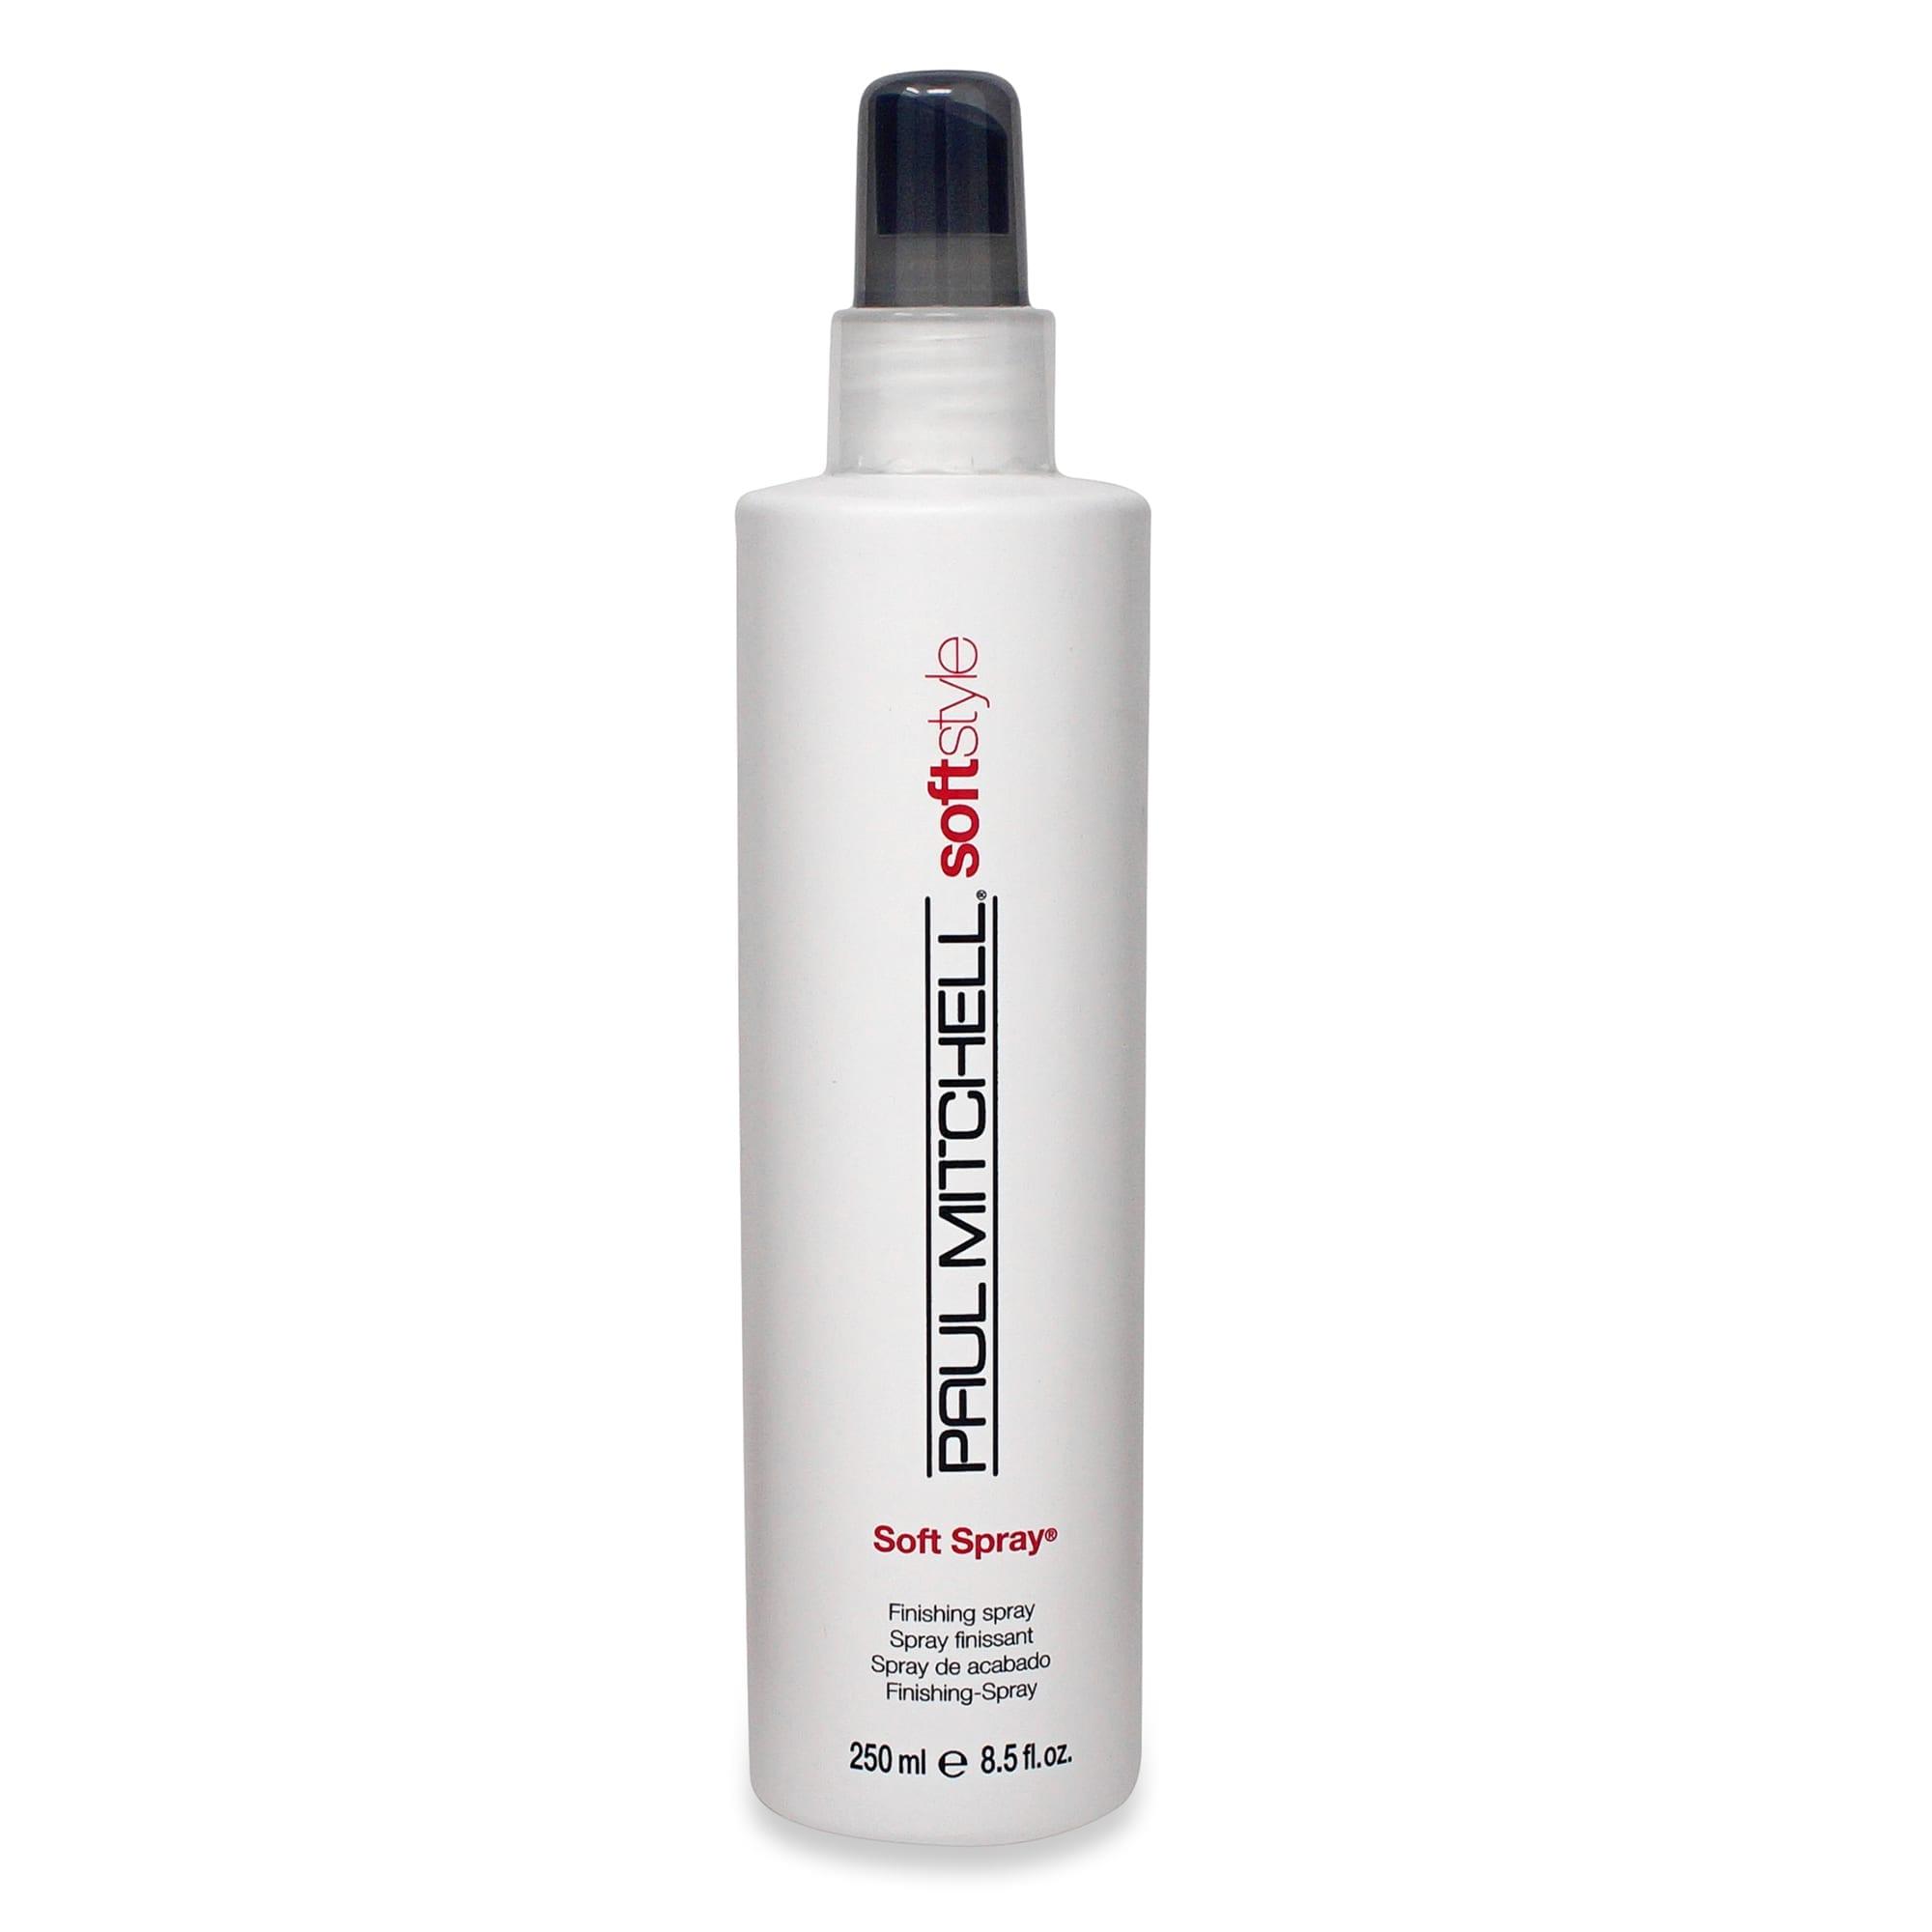 Paul Mitchell Soft Spray 8.5 oz.